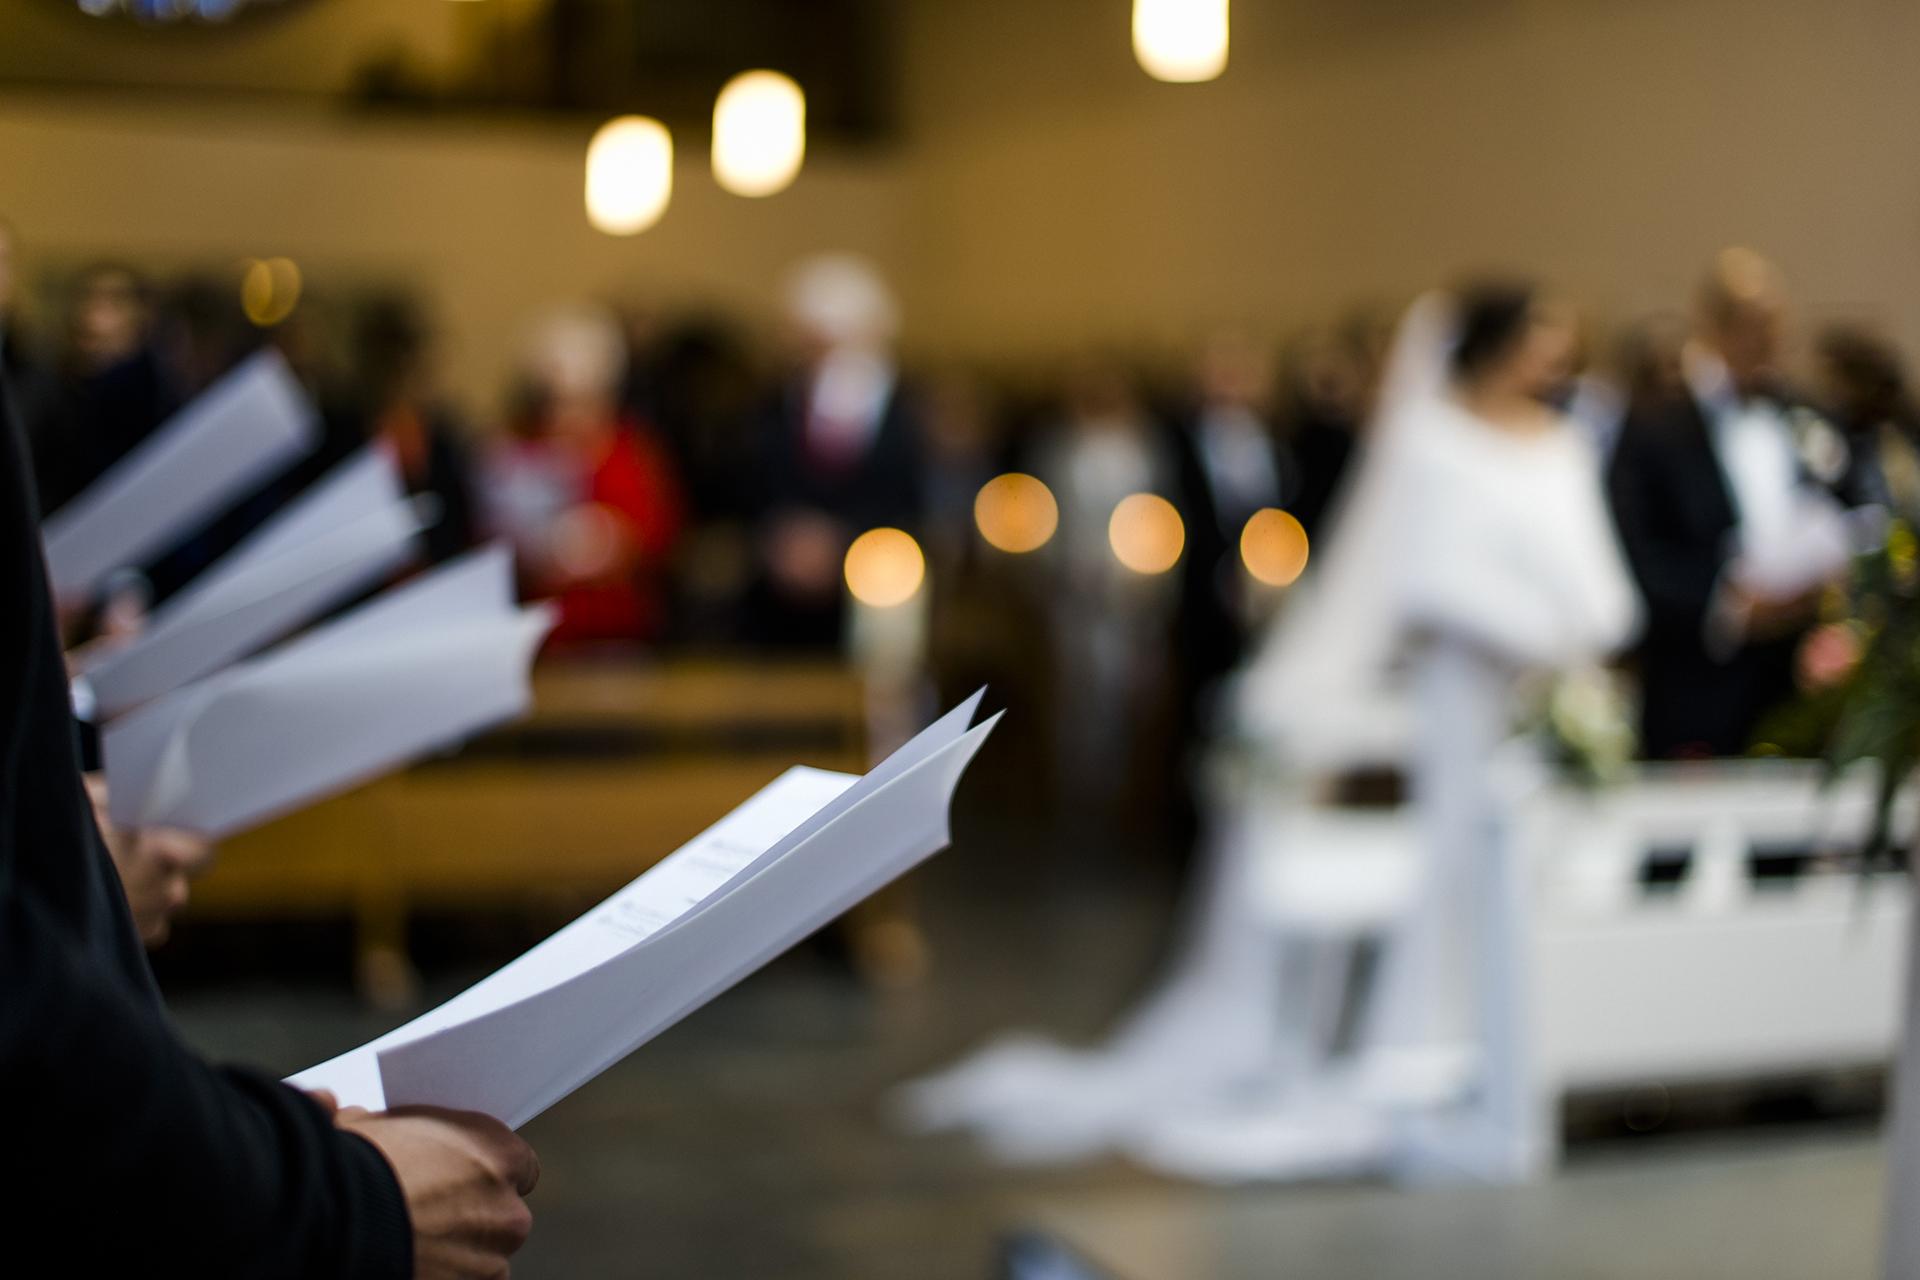 Hochzeitsreportage_J&D_032_Caroline Queda Fotografie